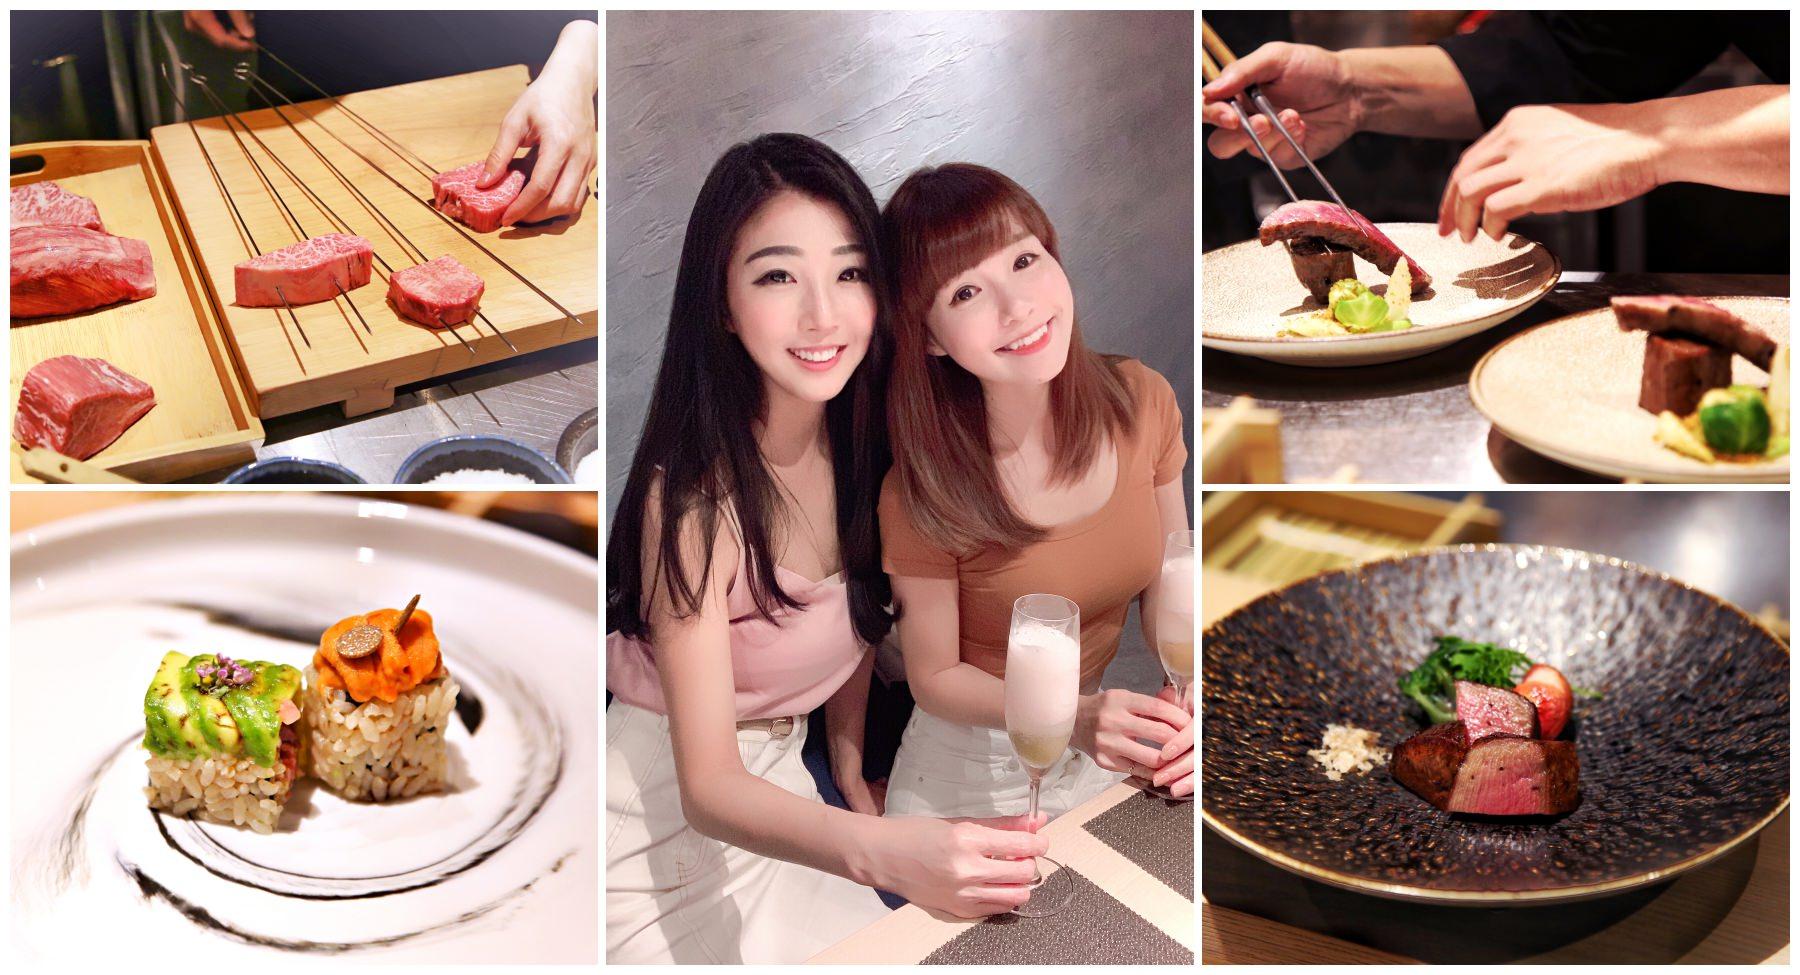 ♥Yoru Omakase♥  窯烤和牛日式法餐 よる2019二訪夏季菜單!( 東區/微風廣場旁/捷運南京復興站/忠孝復興站)♥ JoyceWu。食記